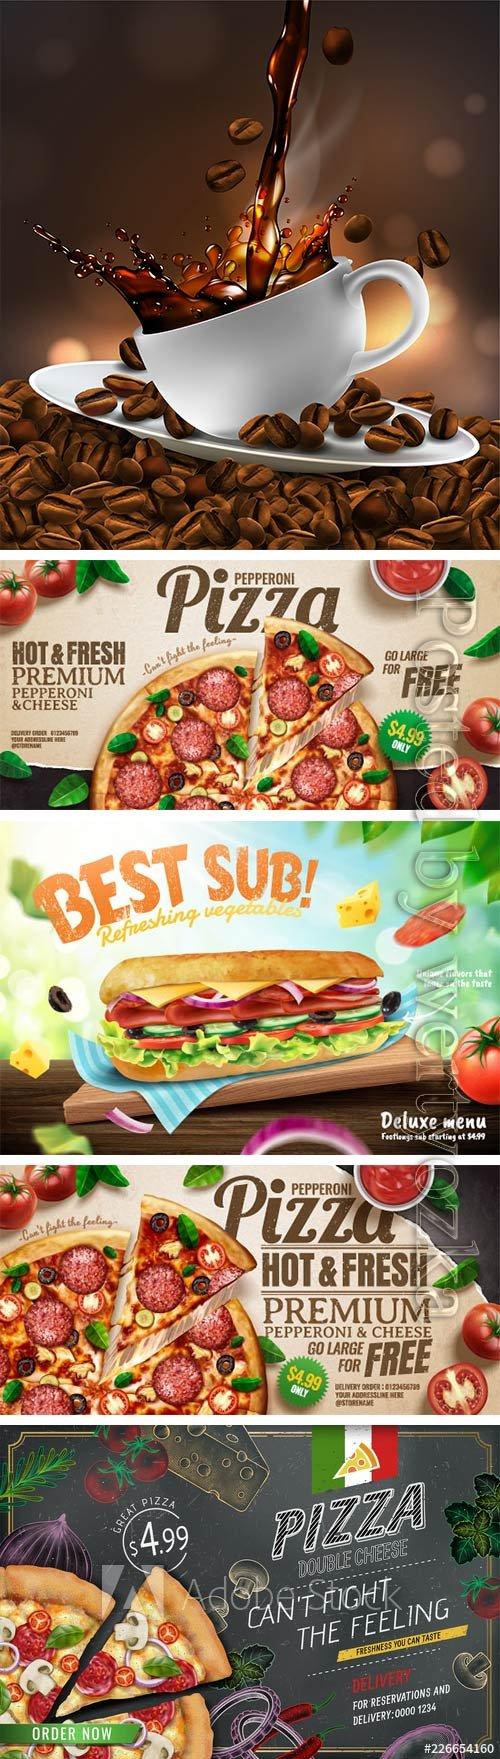 Delicious submarine, pizza, coffee ads